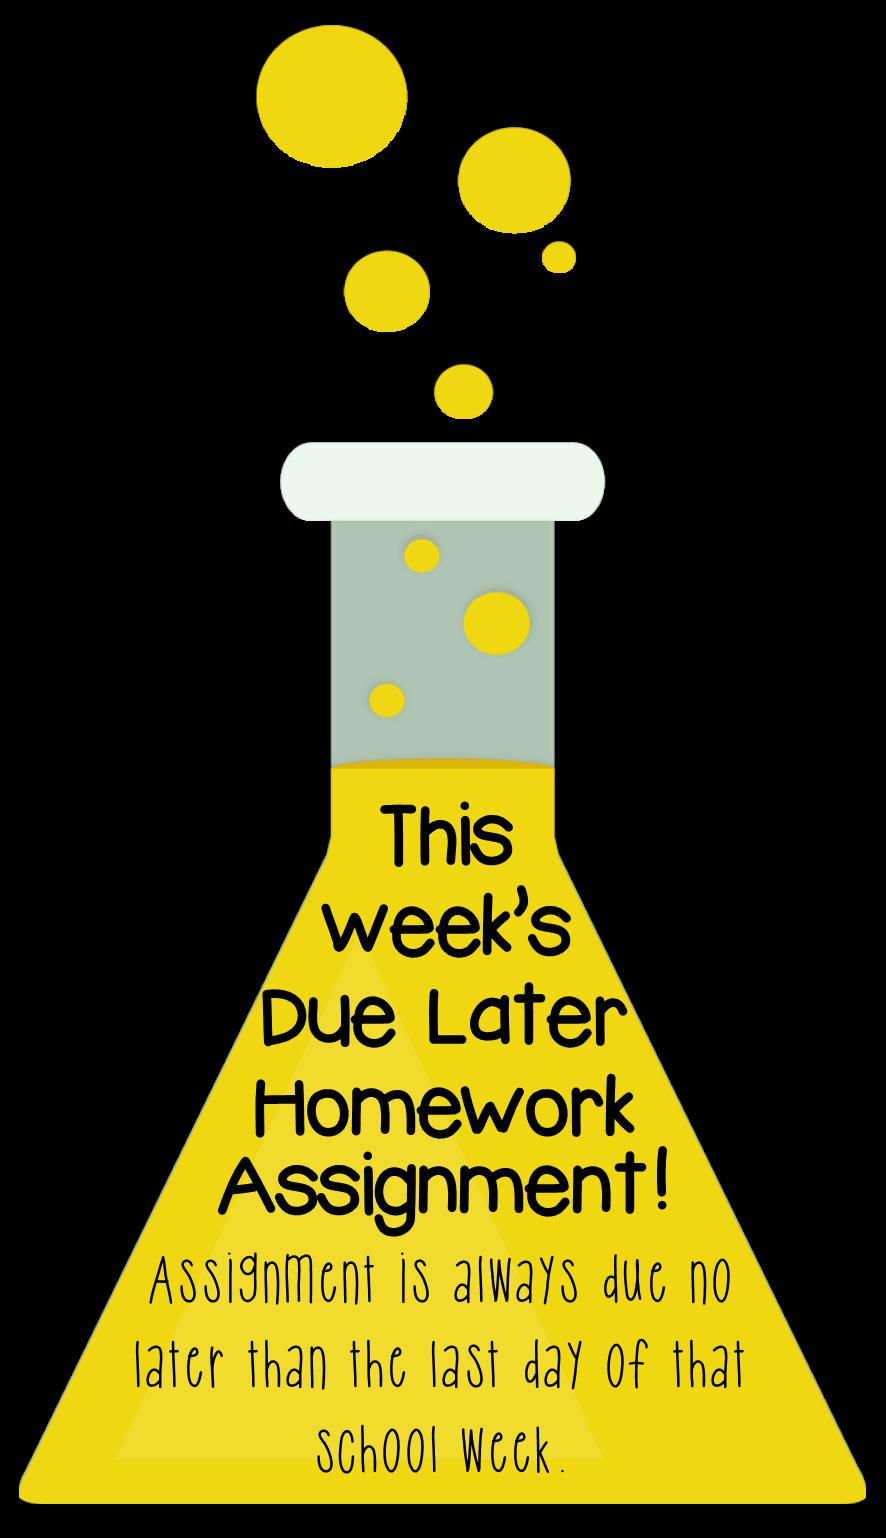 fms billies science mrs aldrich homework list maker english homework list crossword